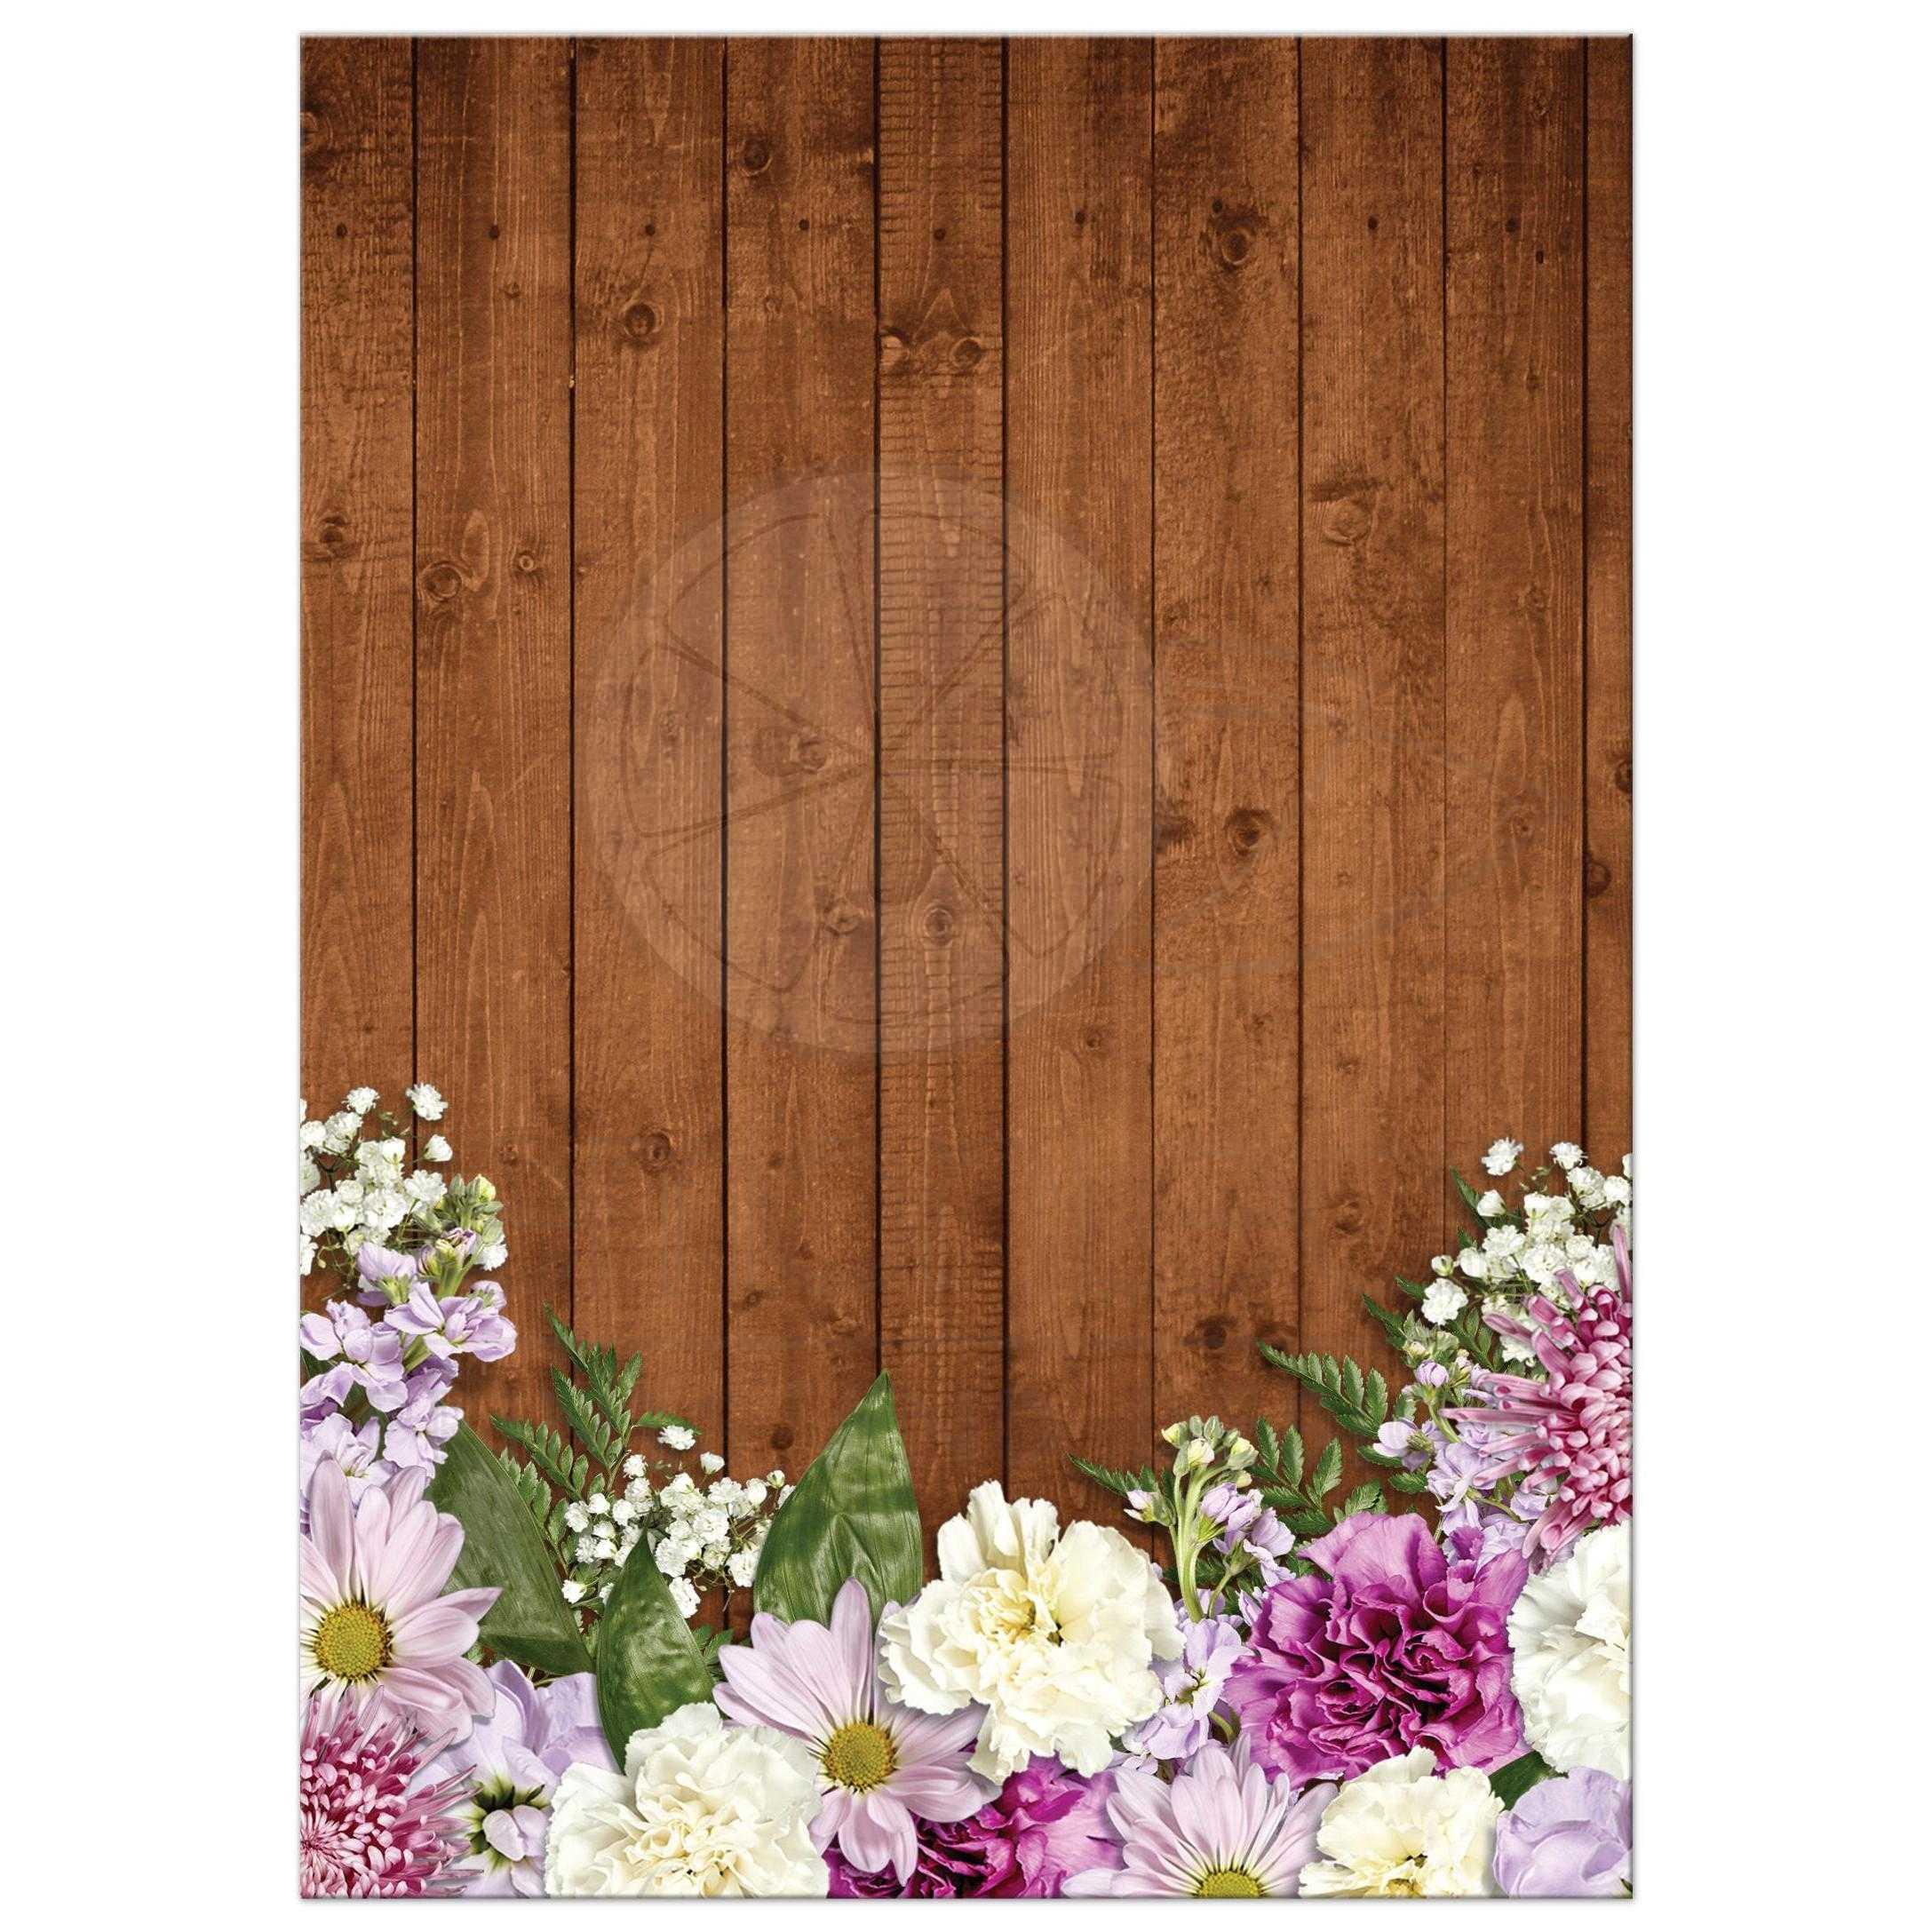 Rustic Spring Chalkboard Picture Frame Floral Wedding Invitation